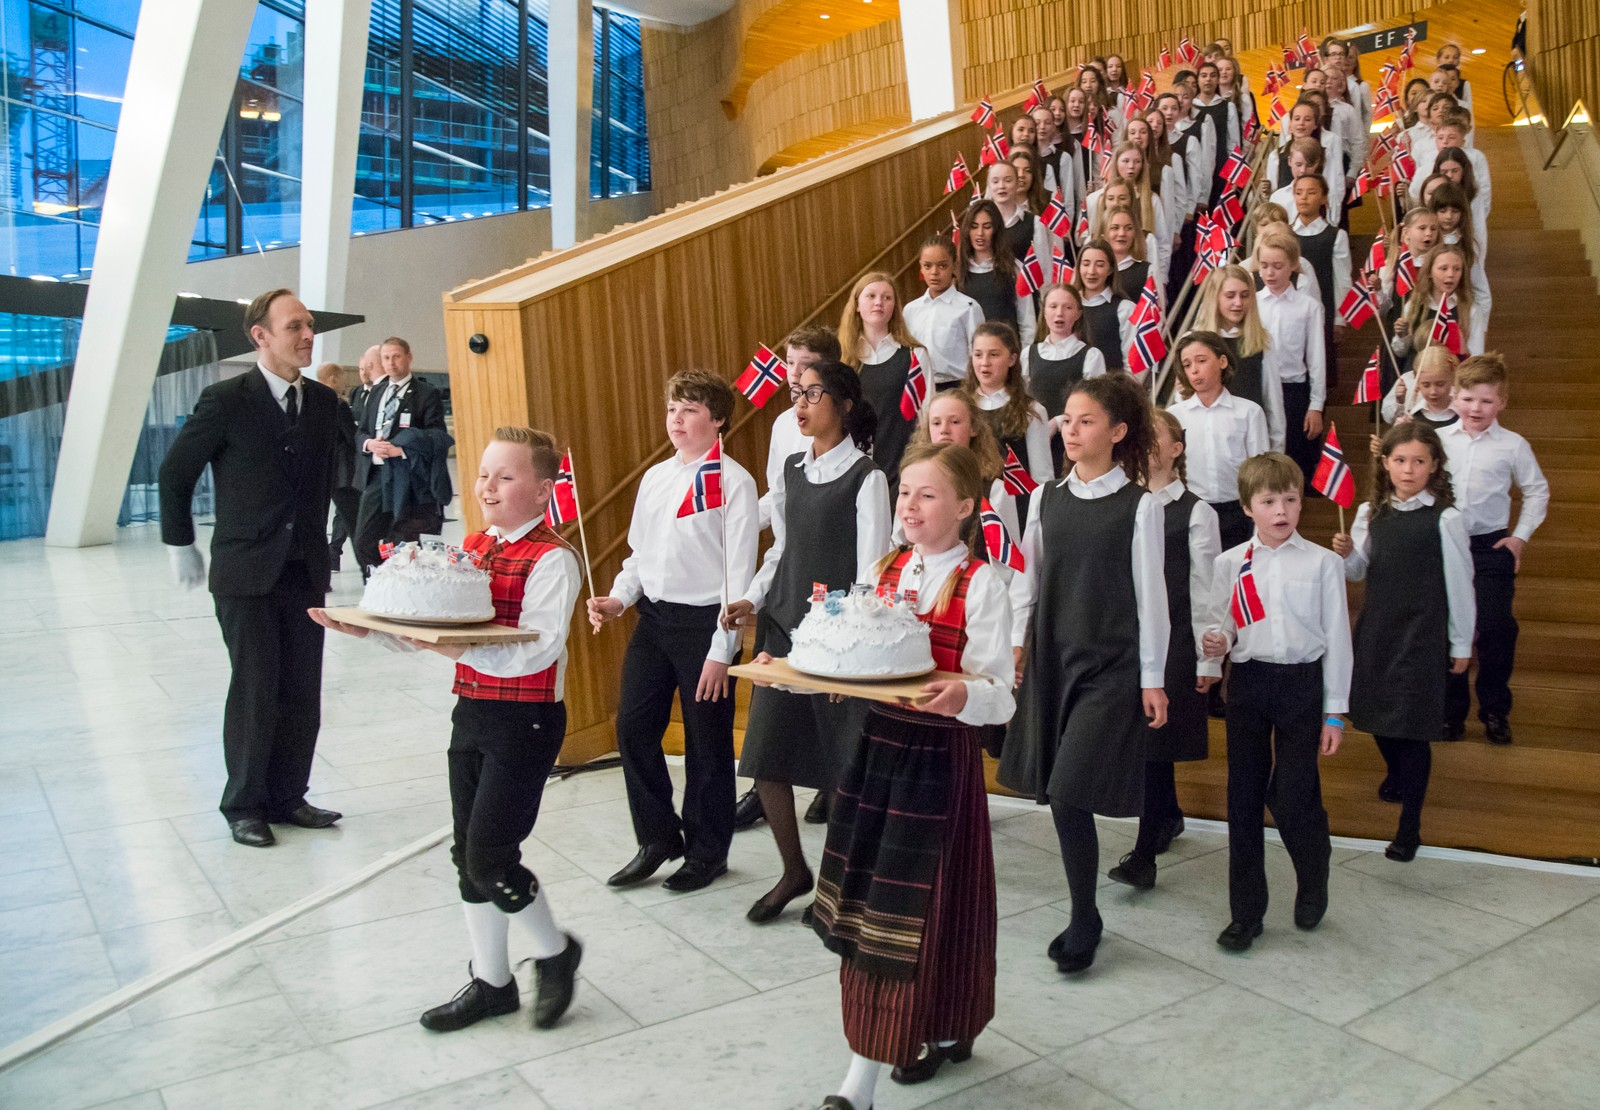 Den Norske Opera Barnekor synger bursdagssang under regjeringens festmiddag for kongeparet i Operaen i anledning deres 80-årsfeiring.